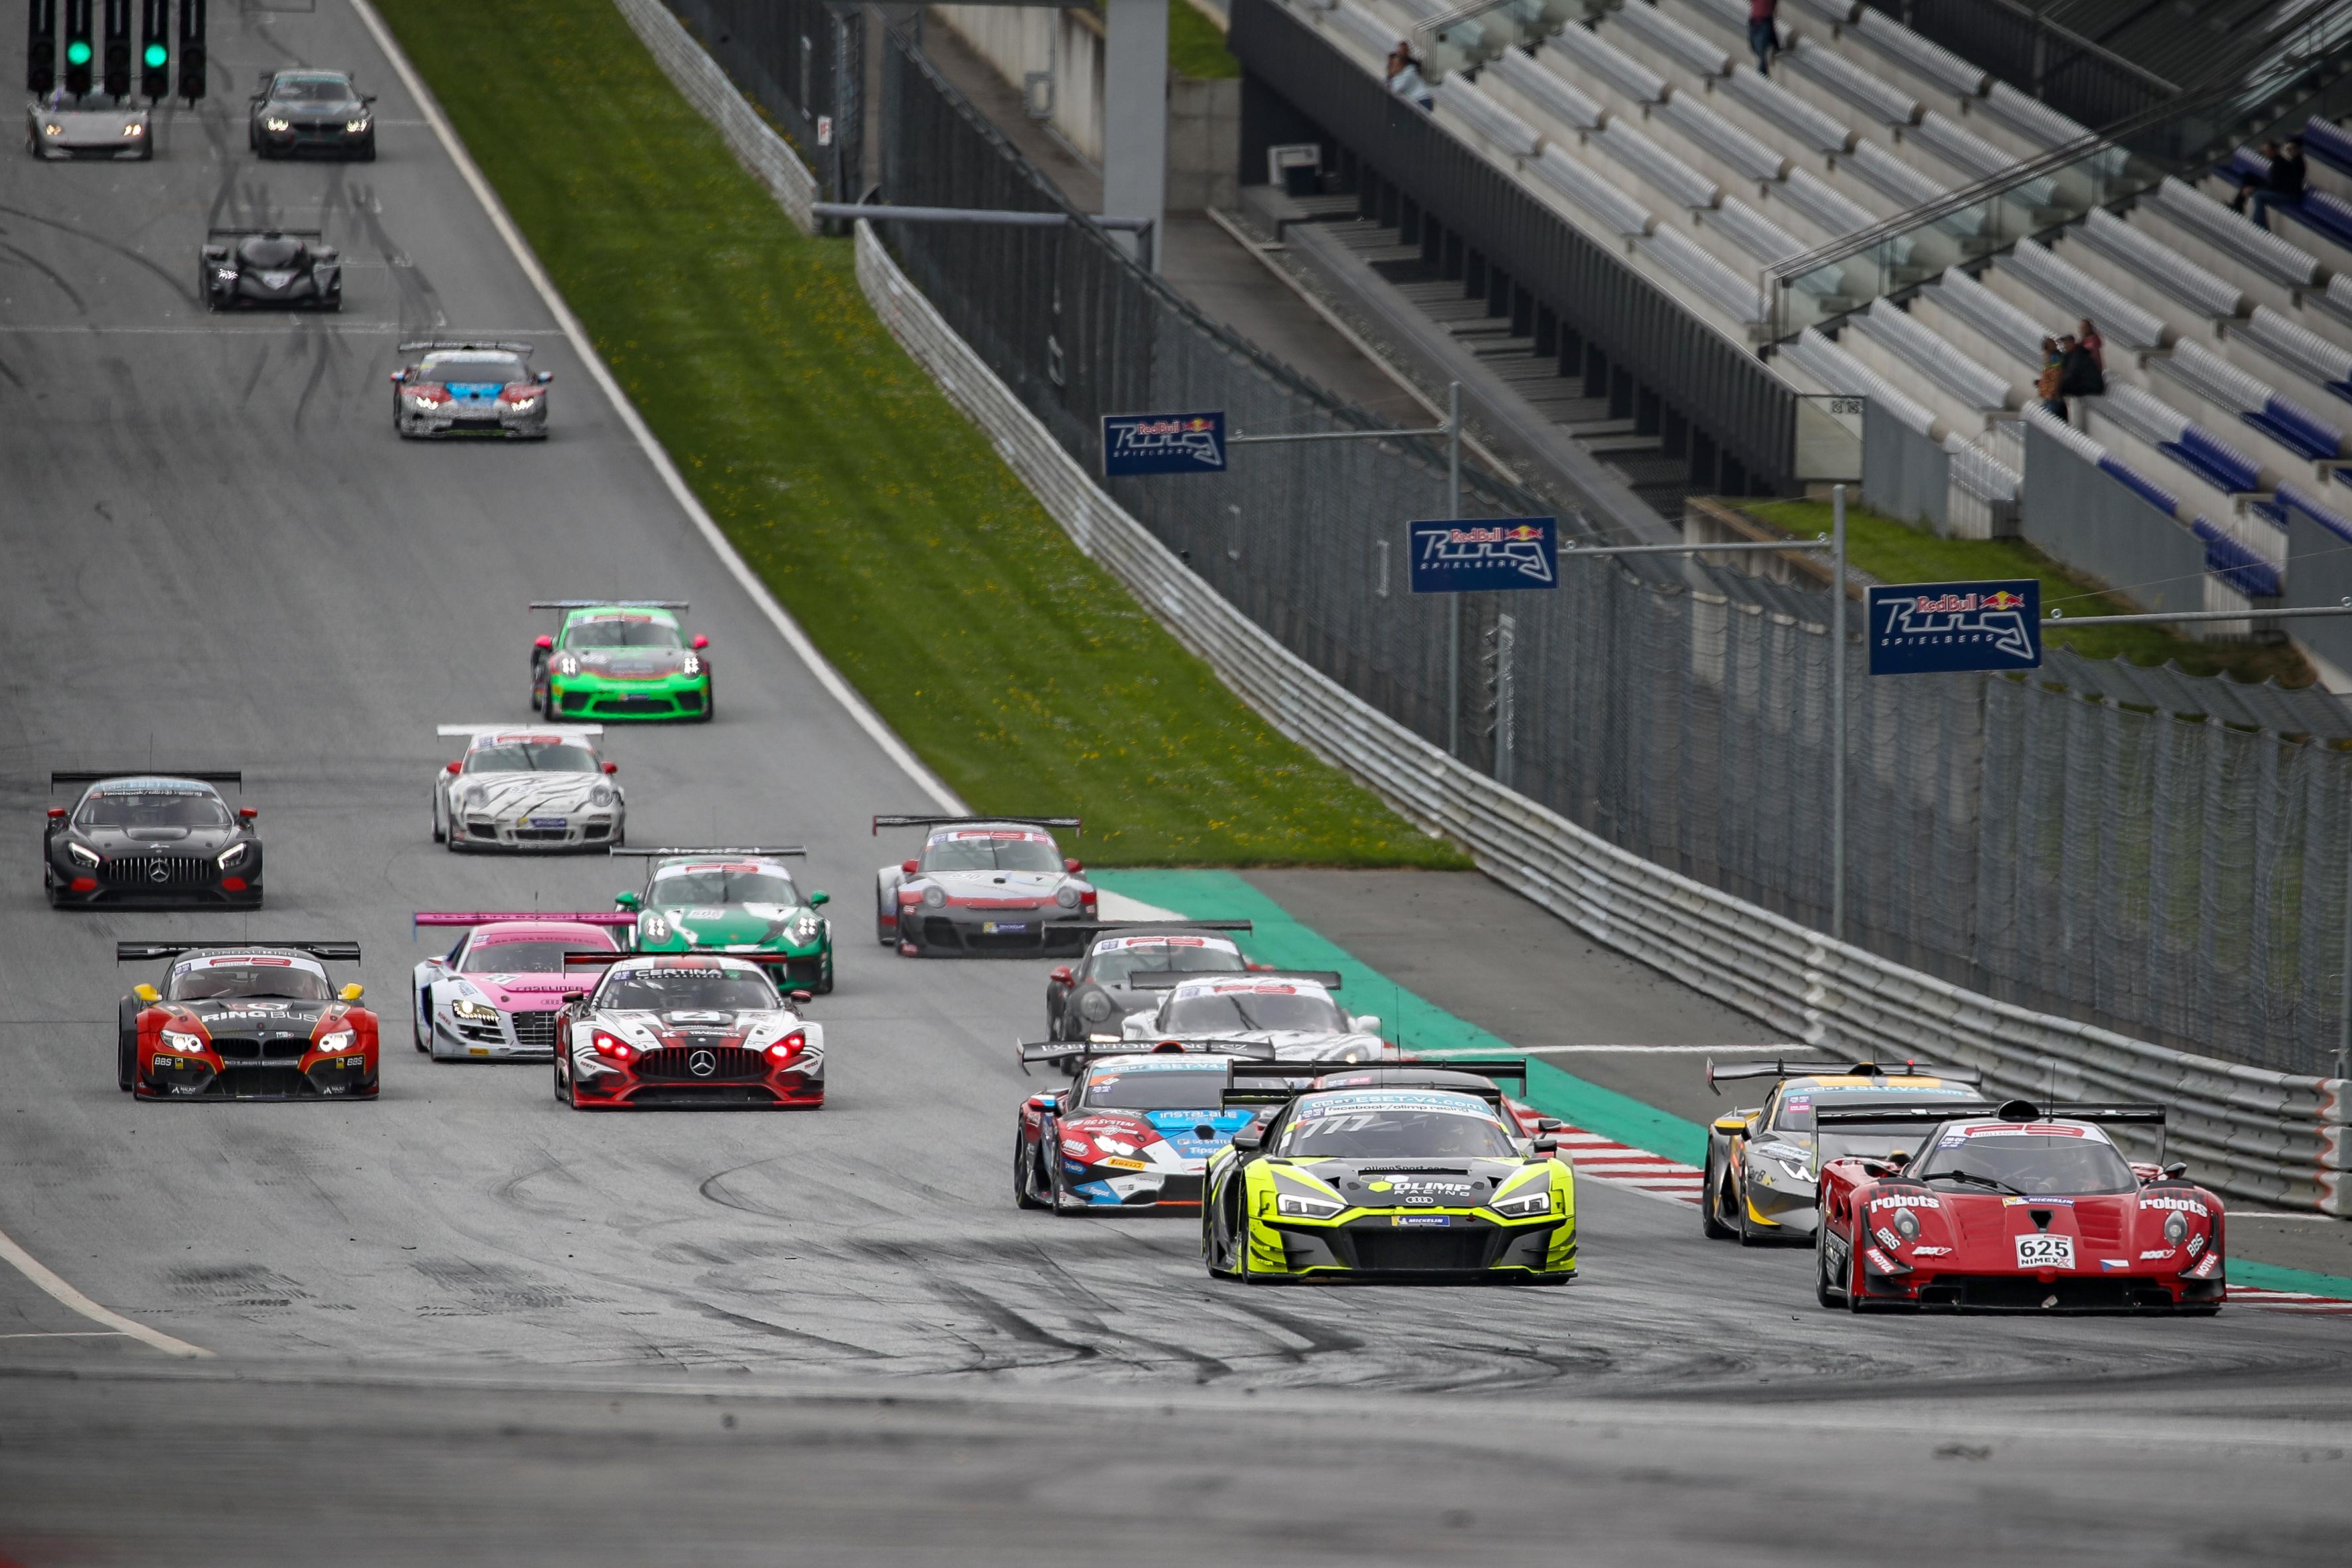 Mateusz Lisowski vyhrál i druhý závod GT